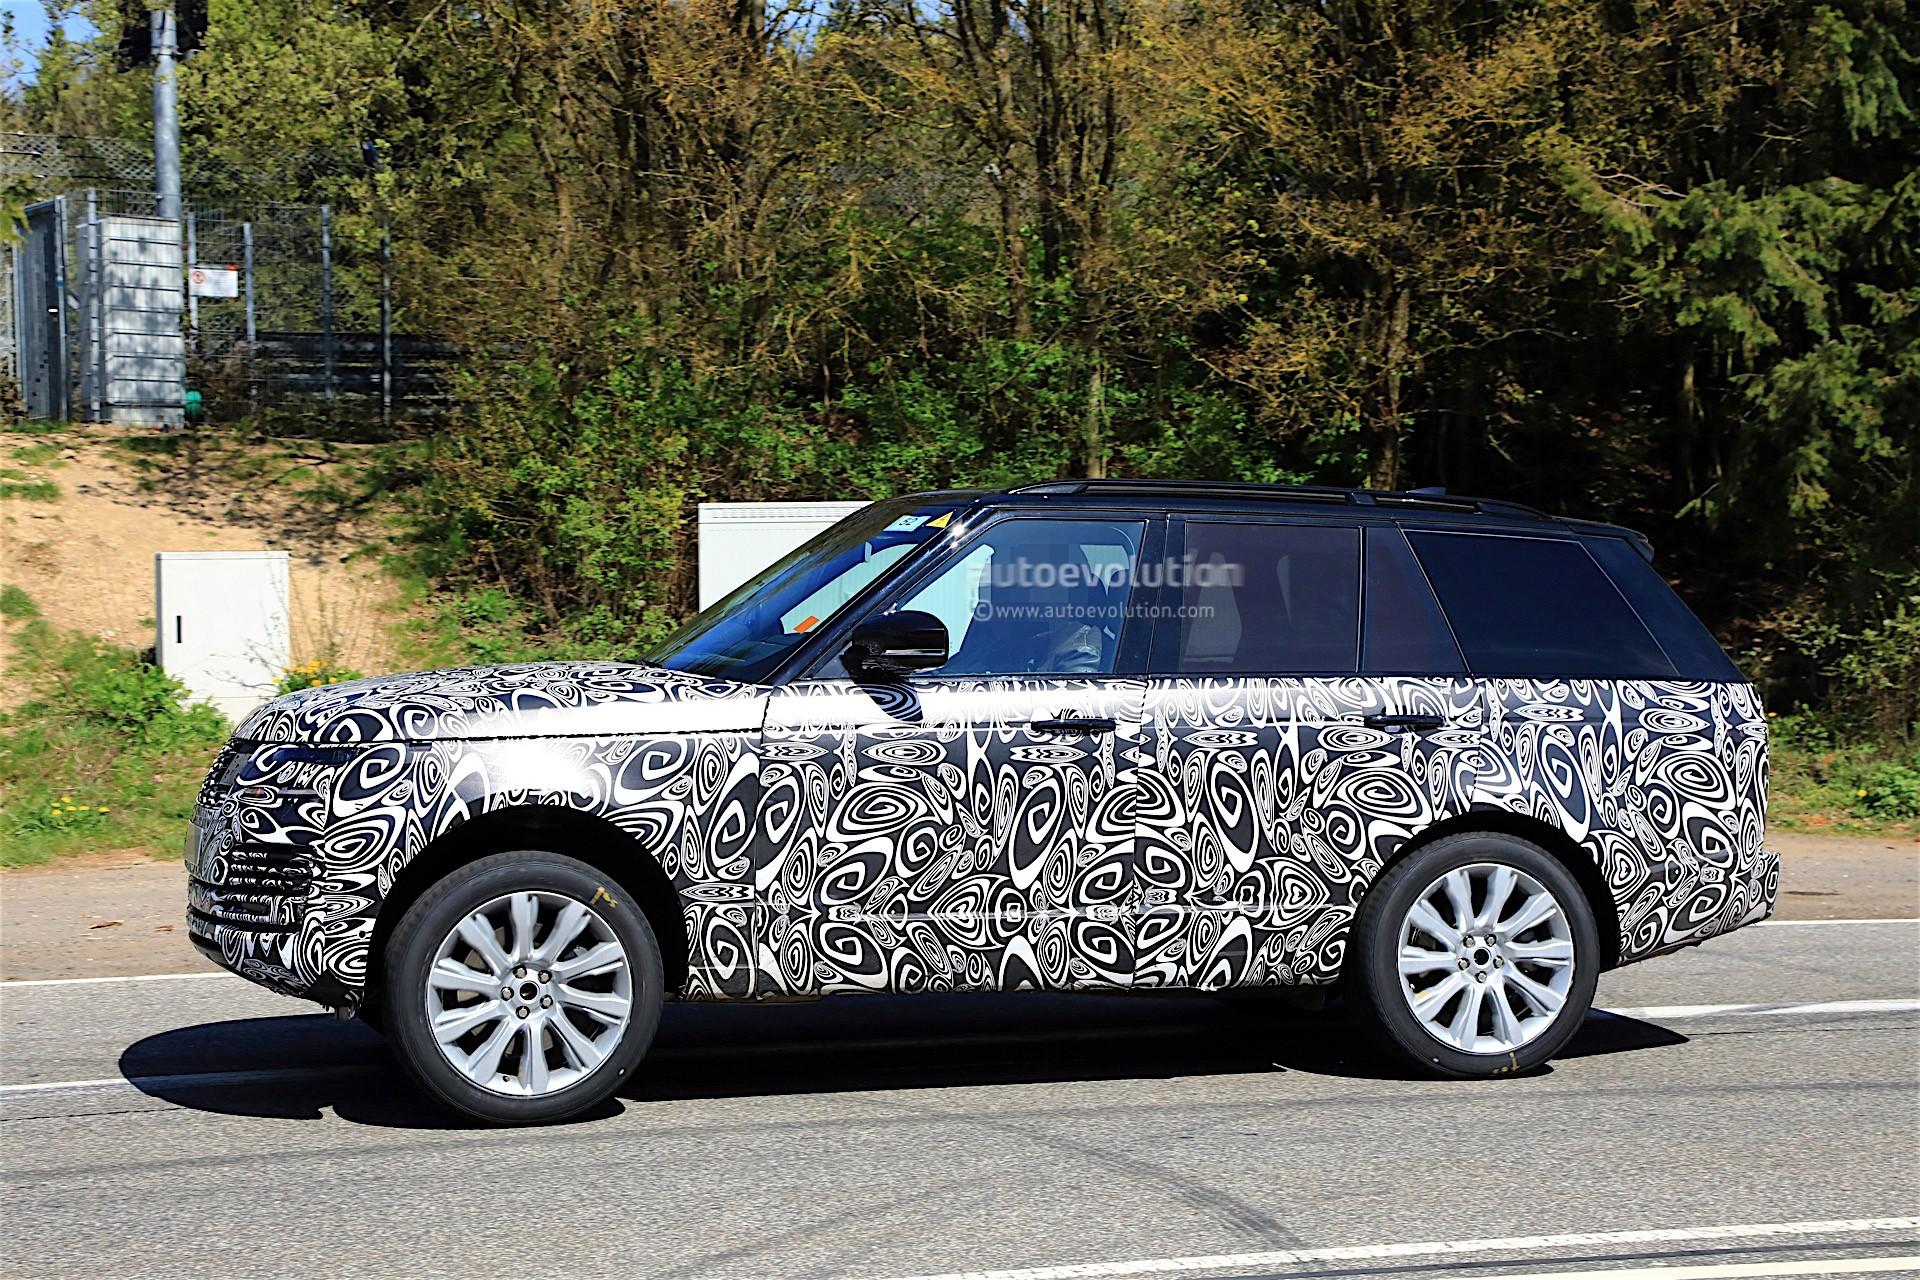 Range Rover Sport Svr 2018 >> 2018 Range Rover Facelift Spied With Updated Interior - autoevolution